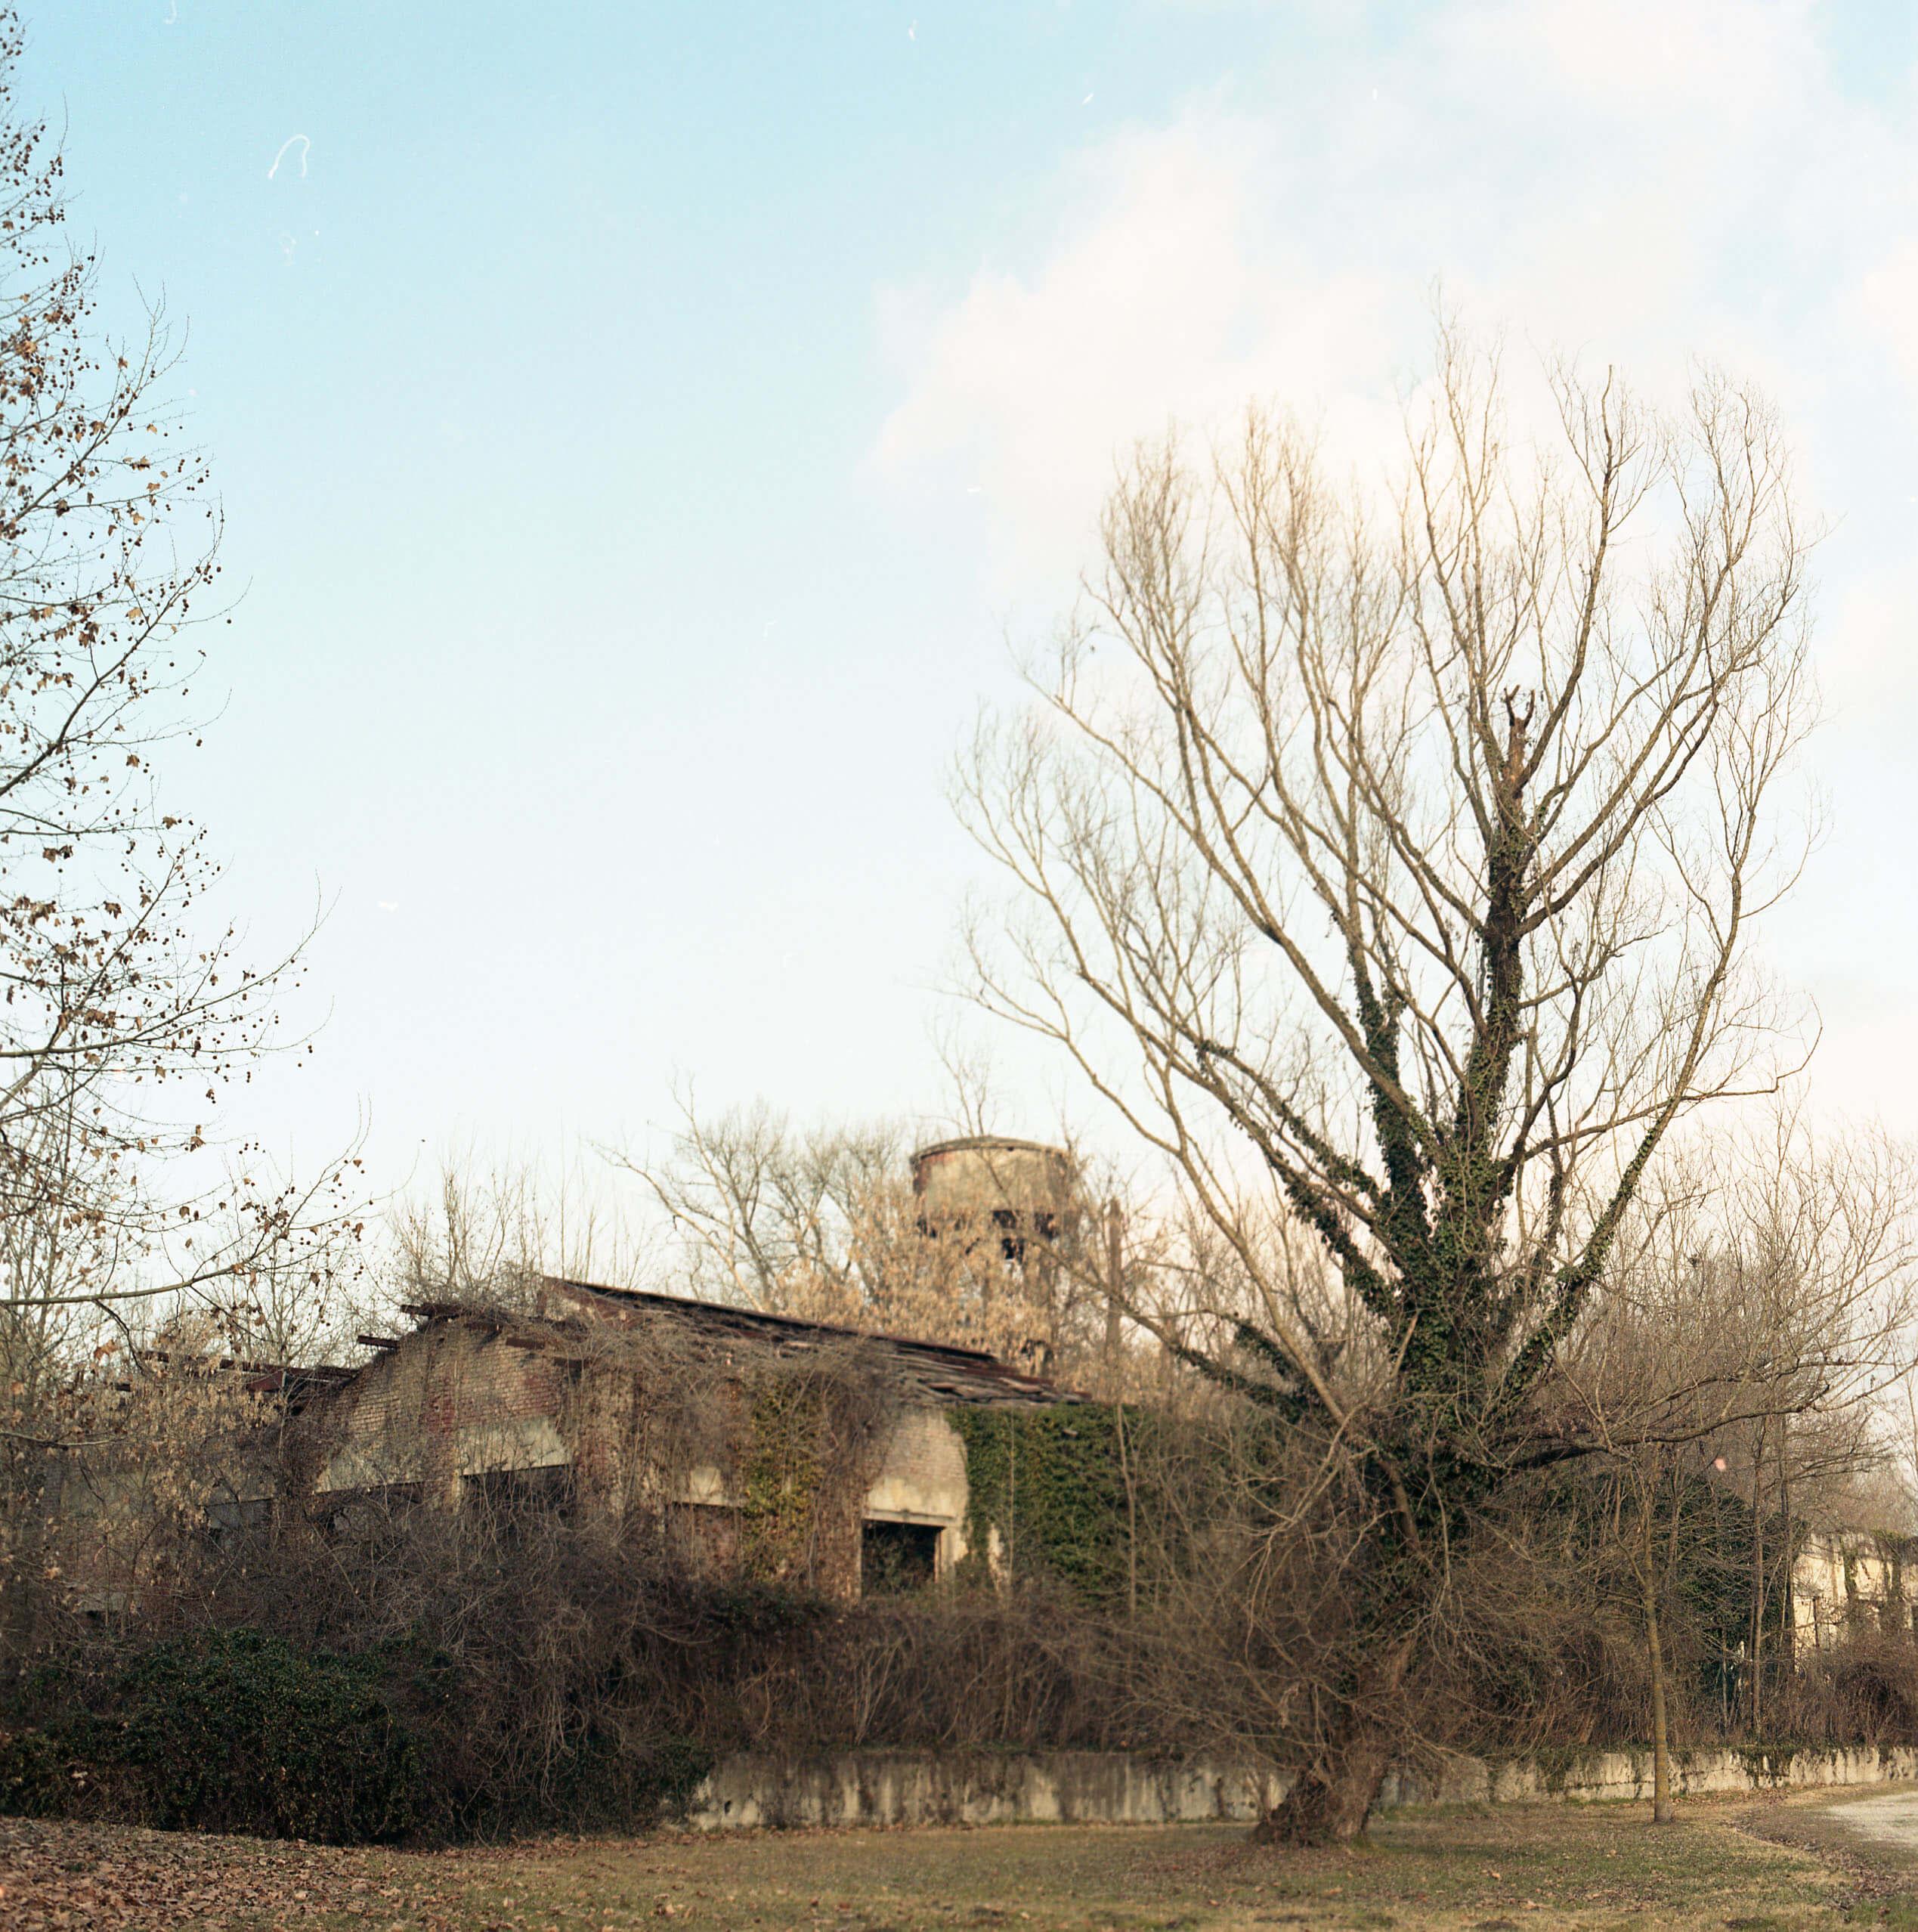 Giulia Simonotti SIAMO TUTTI ALPINI the south west collective of photography photograph of old house